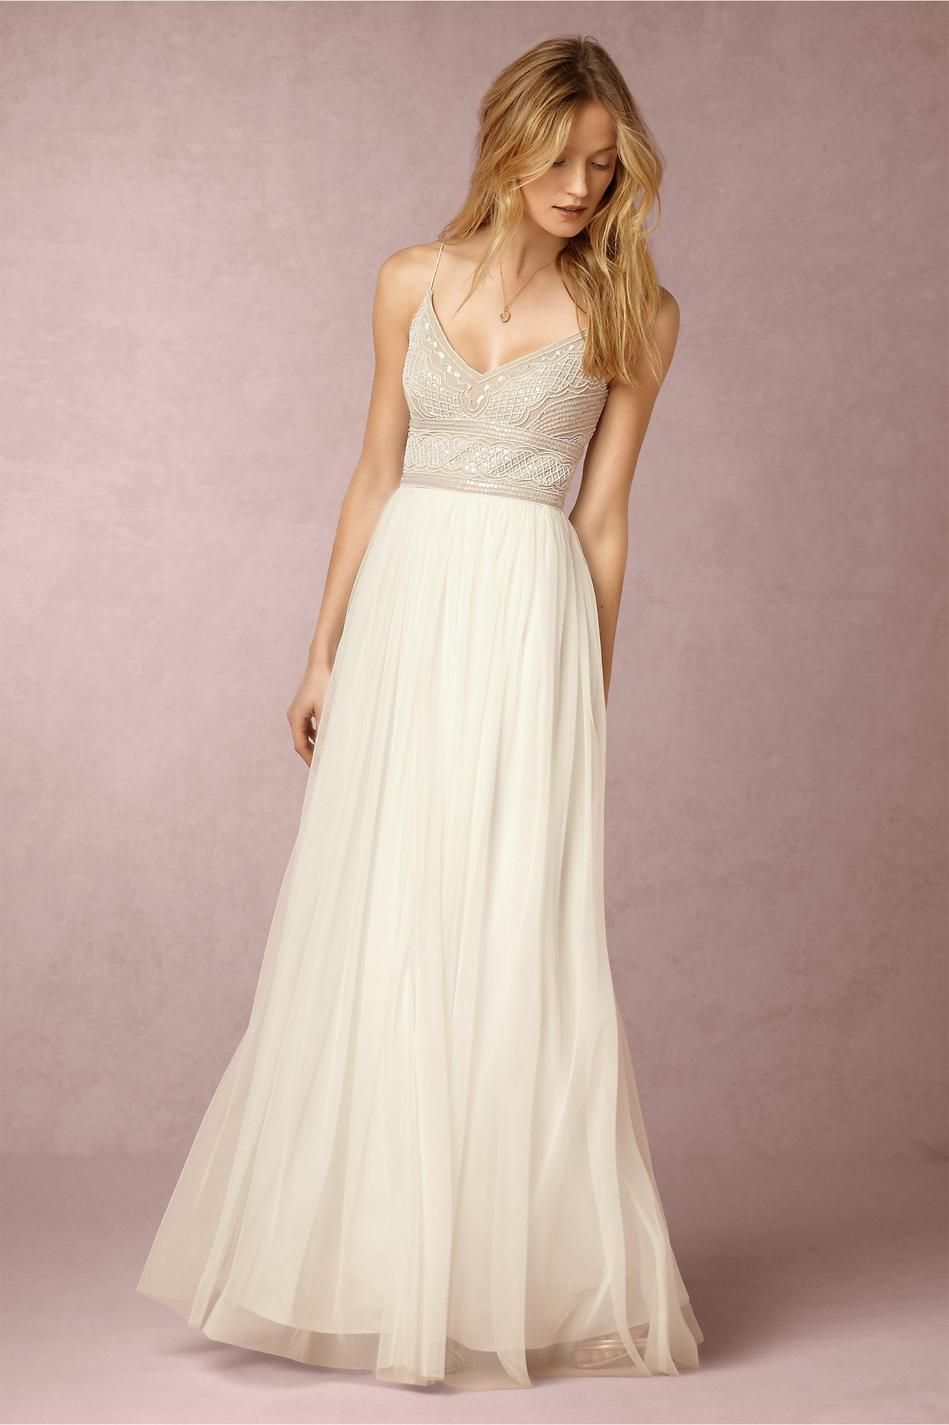 h&m wedding dress australia